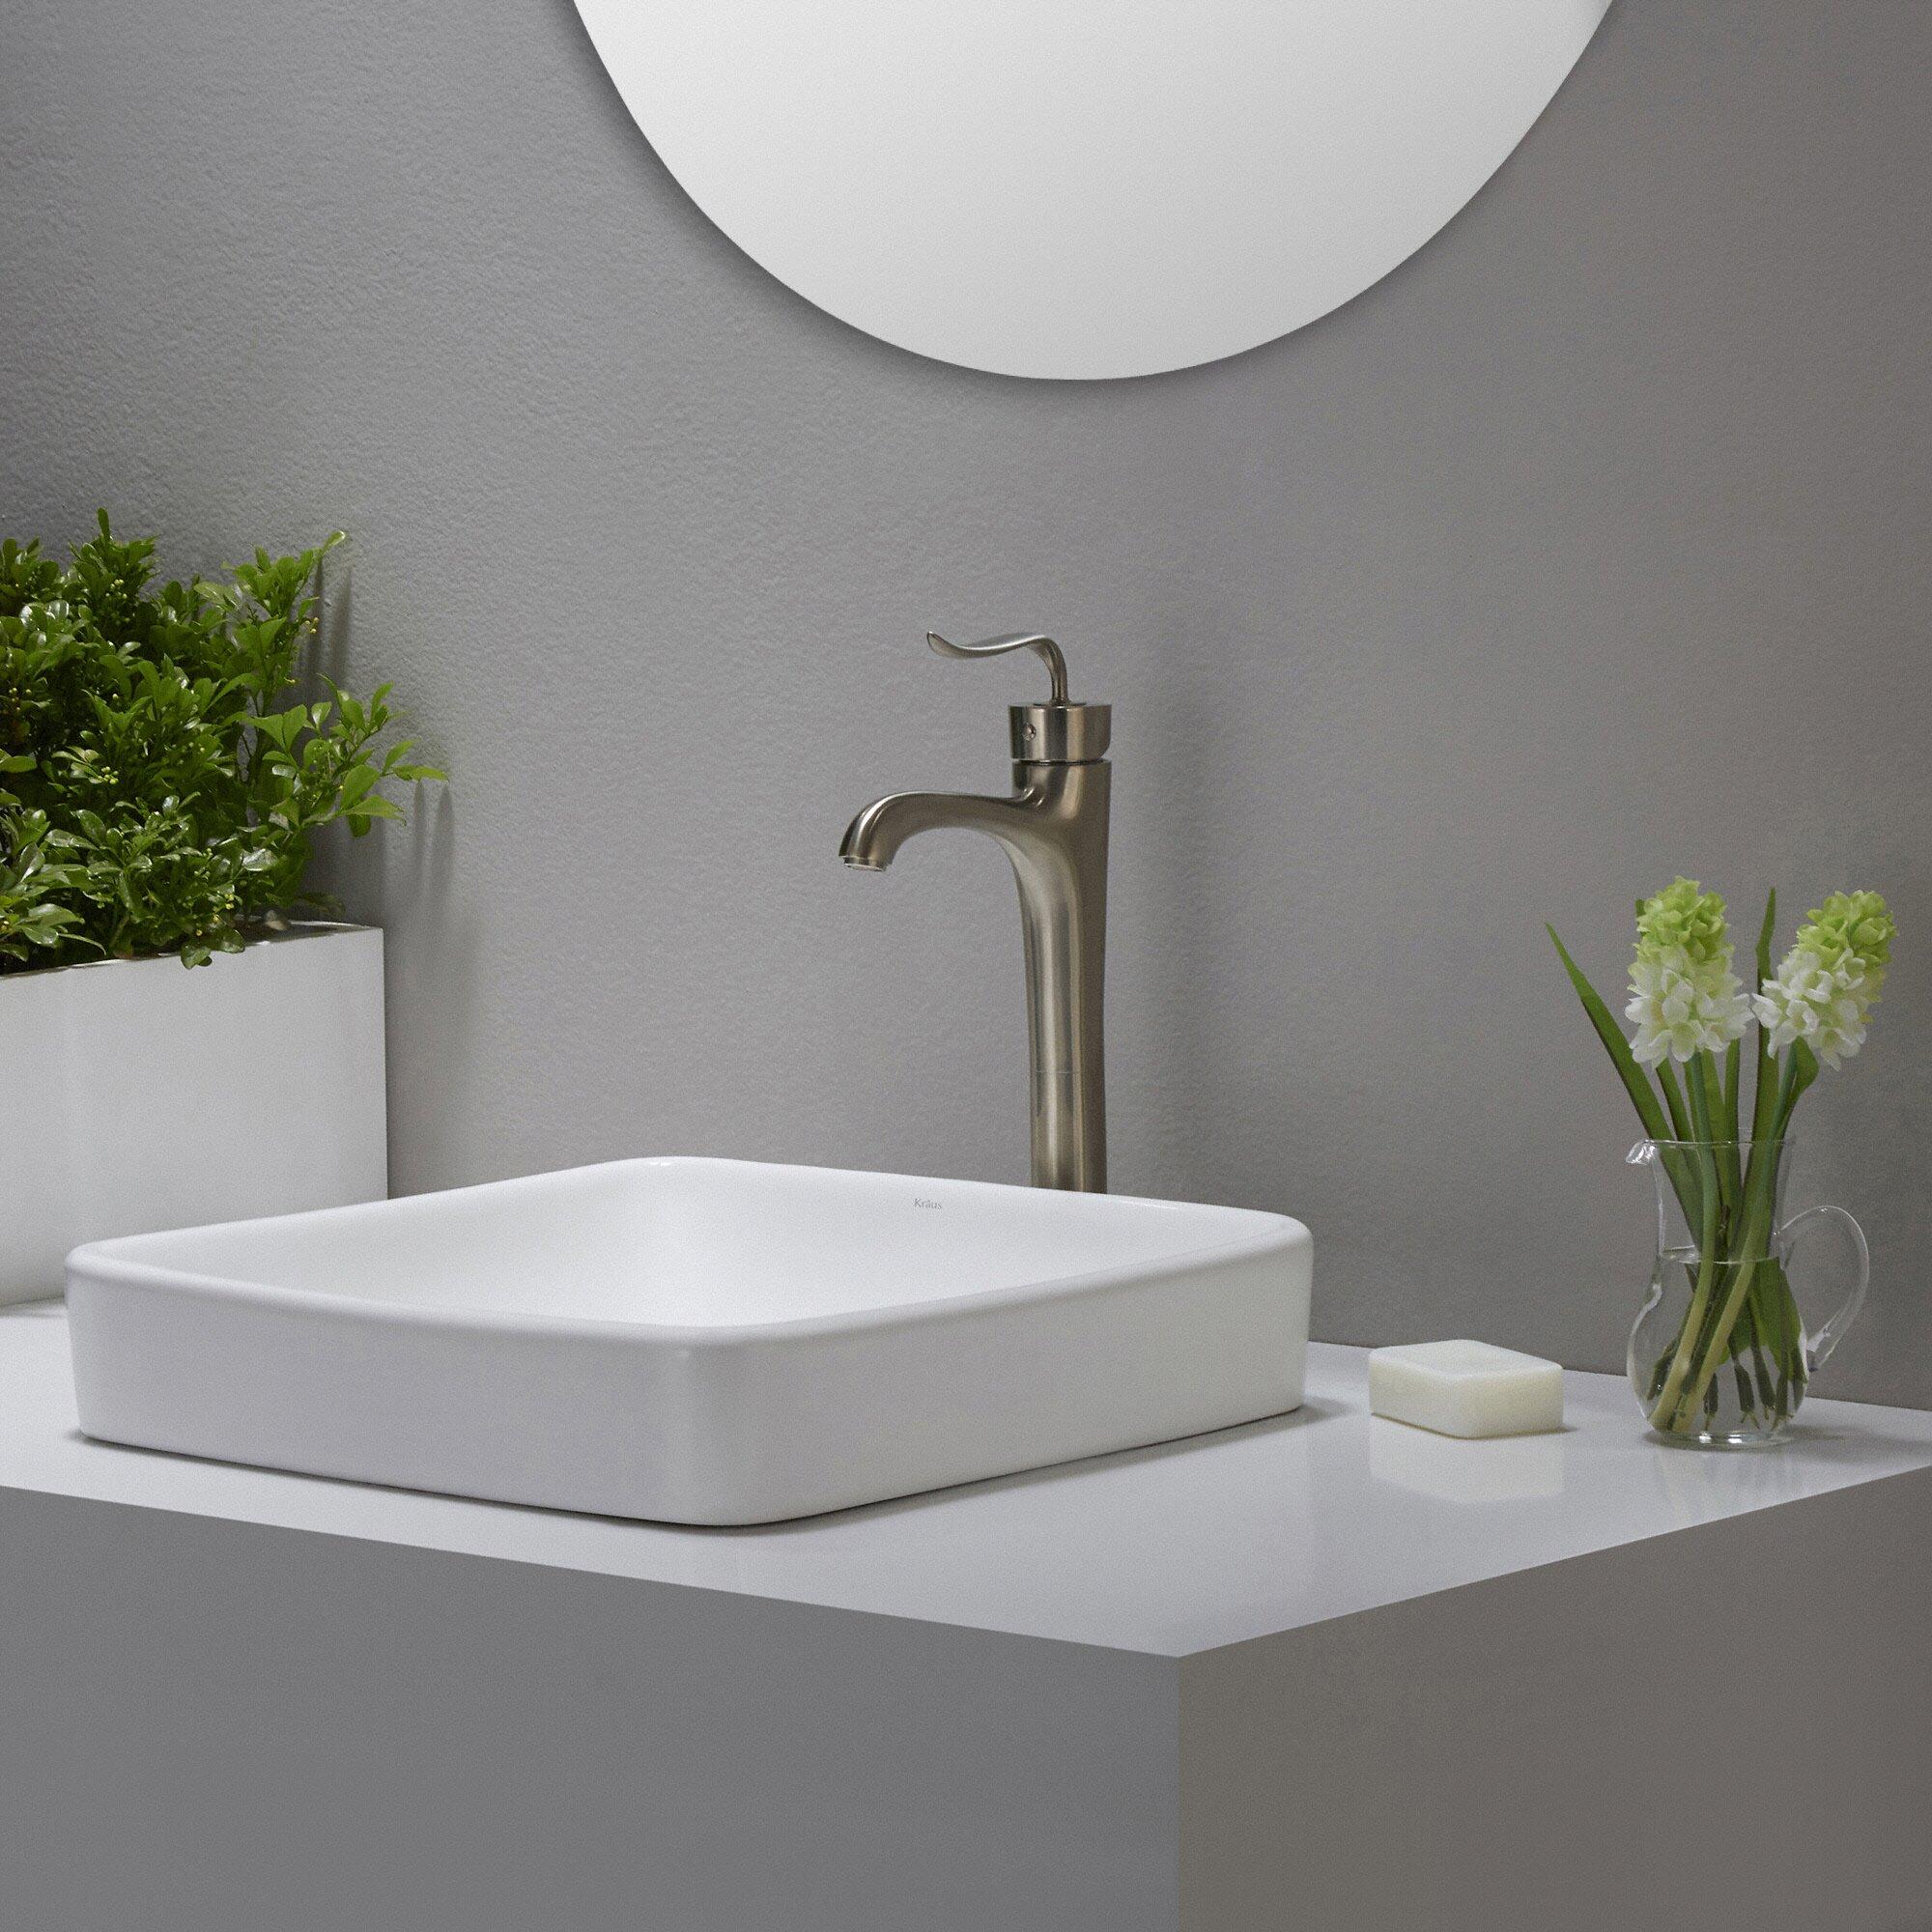 Kraus Elavo Ceramic Square Semi Recessed Bathroom Sink With Overflow Reviews Wayfair